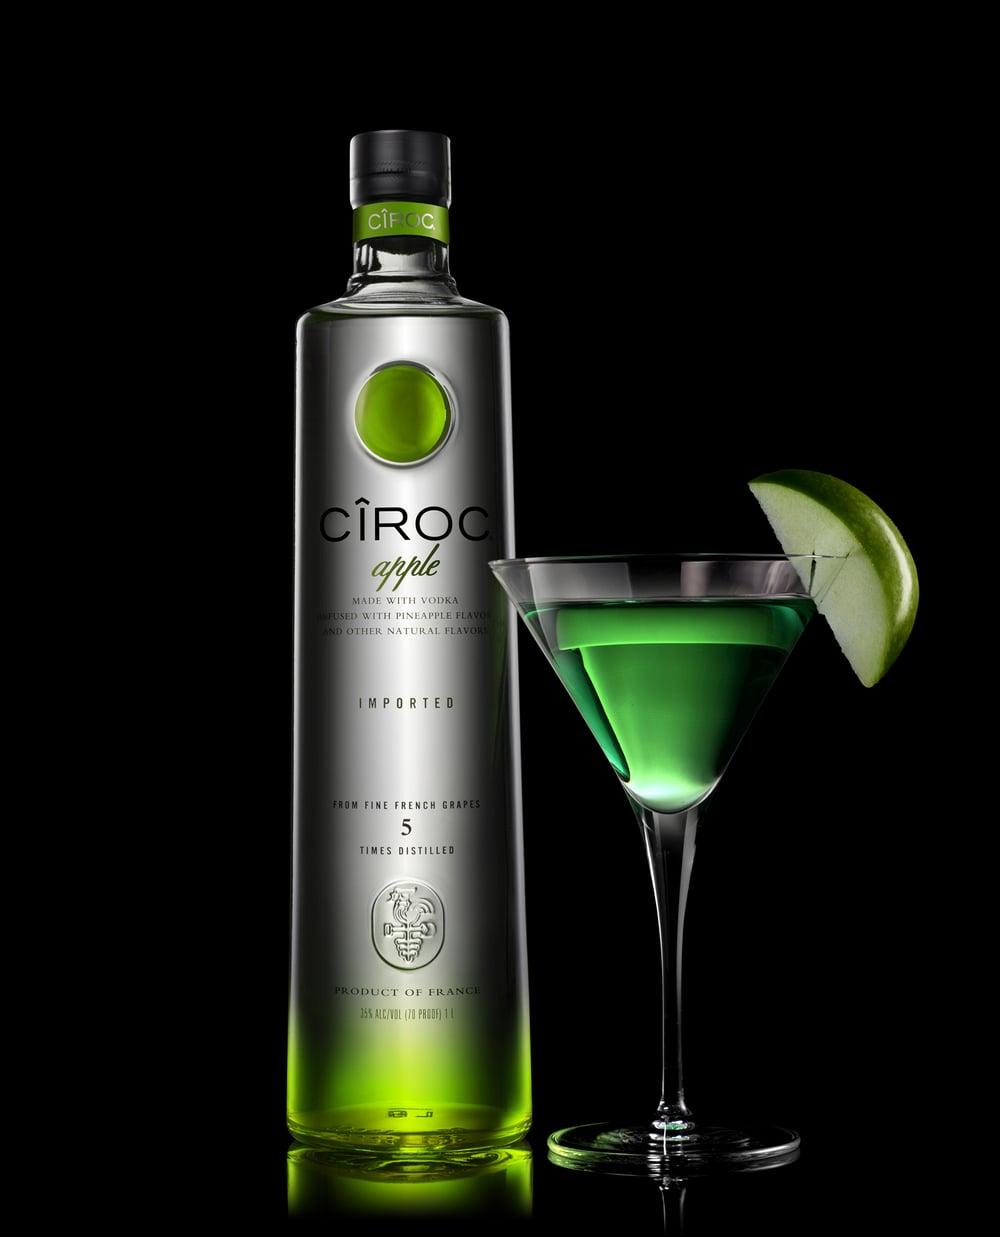 Ciroc_Black Martini.jpg